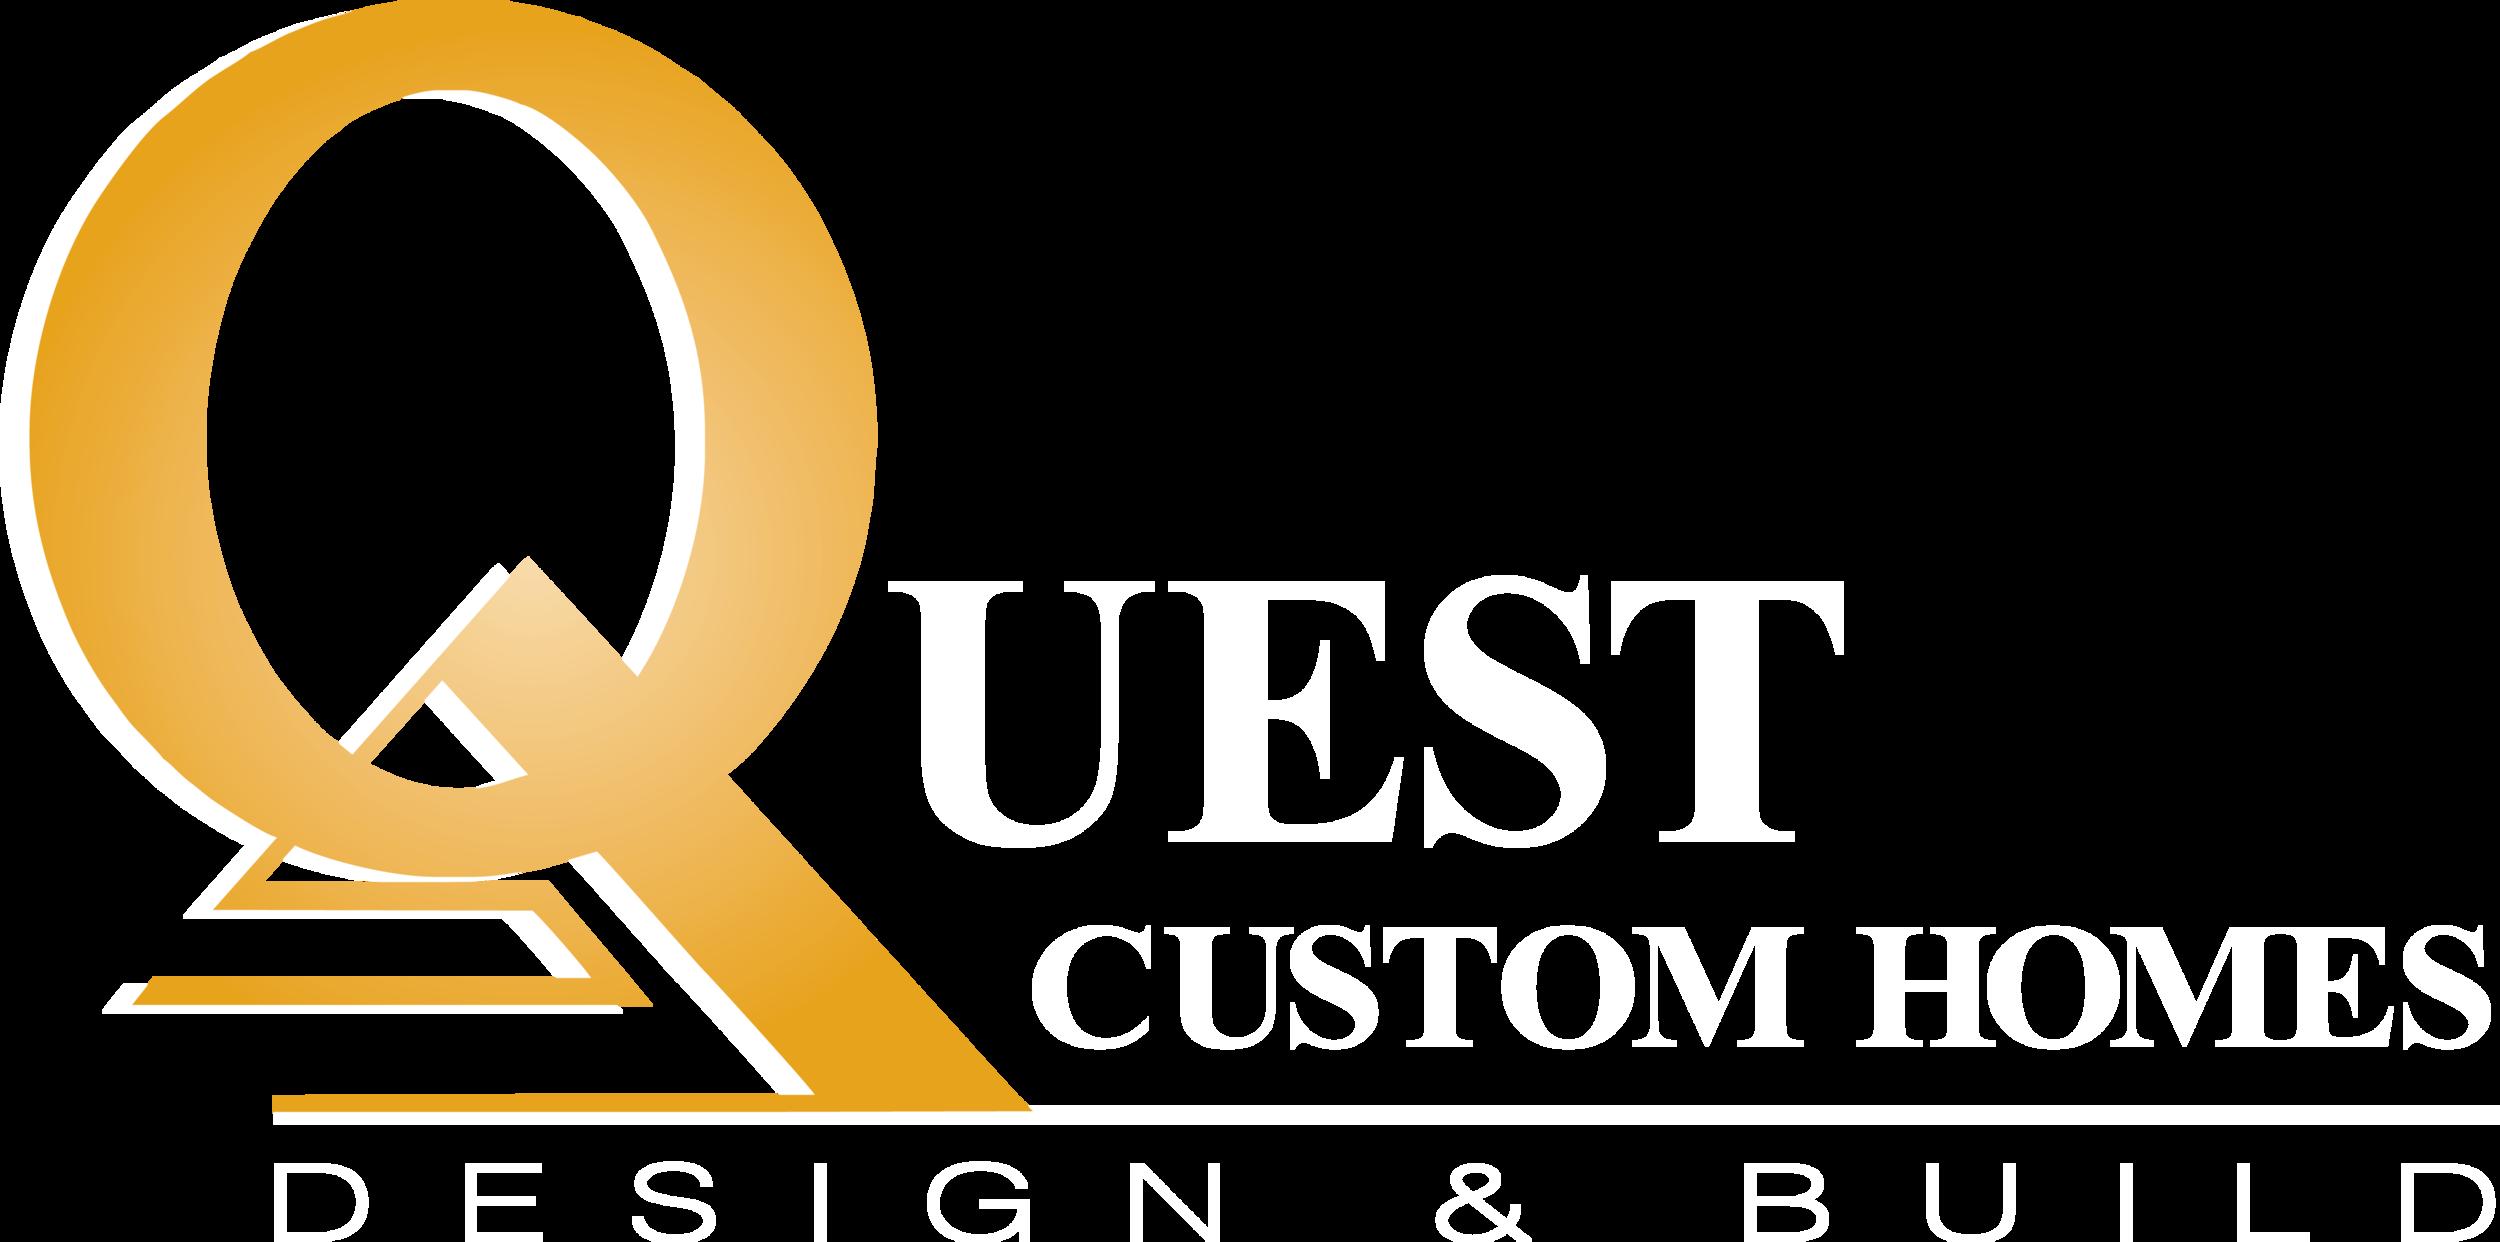 Quest Custom Homes: Design & Build